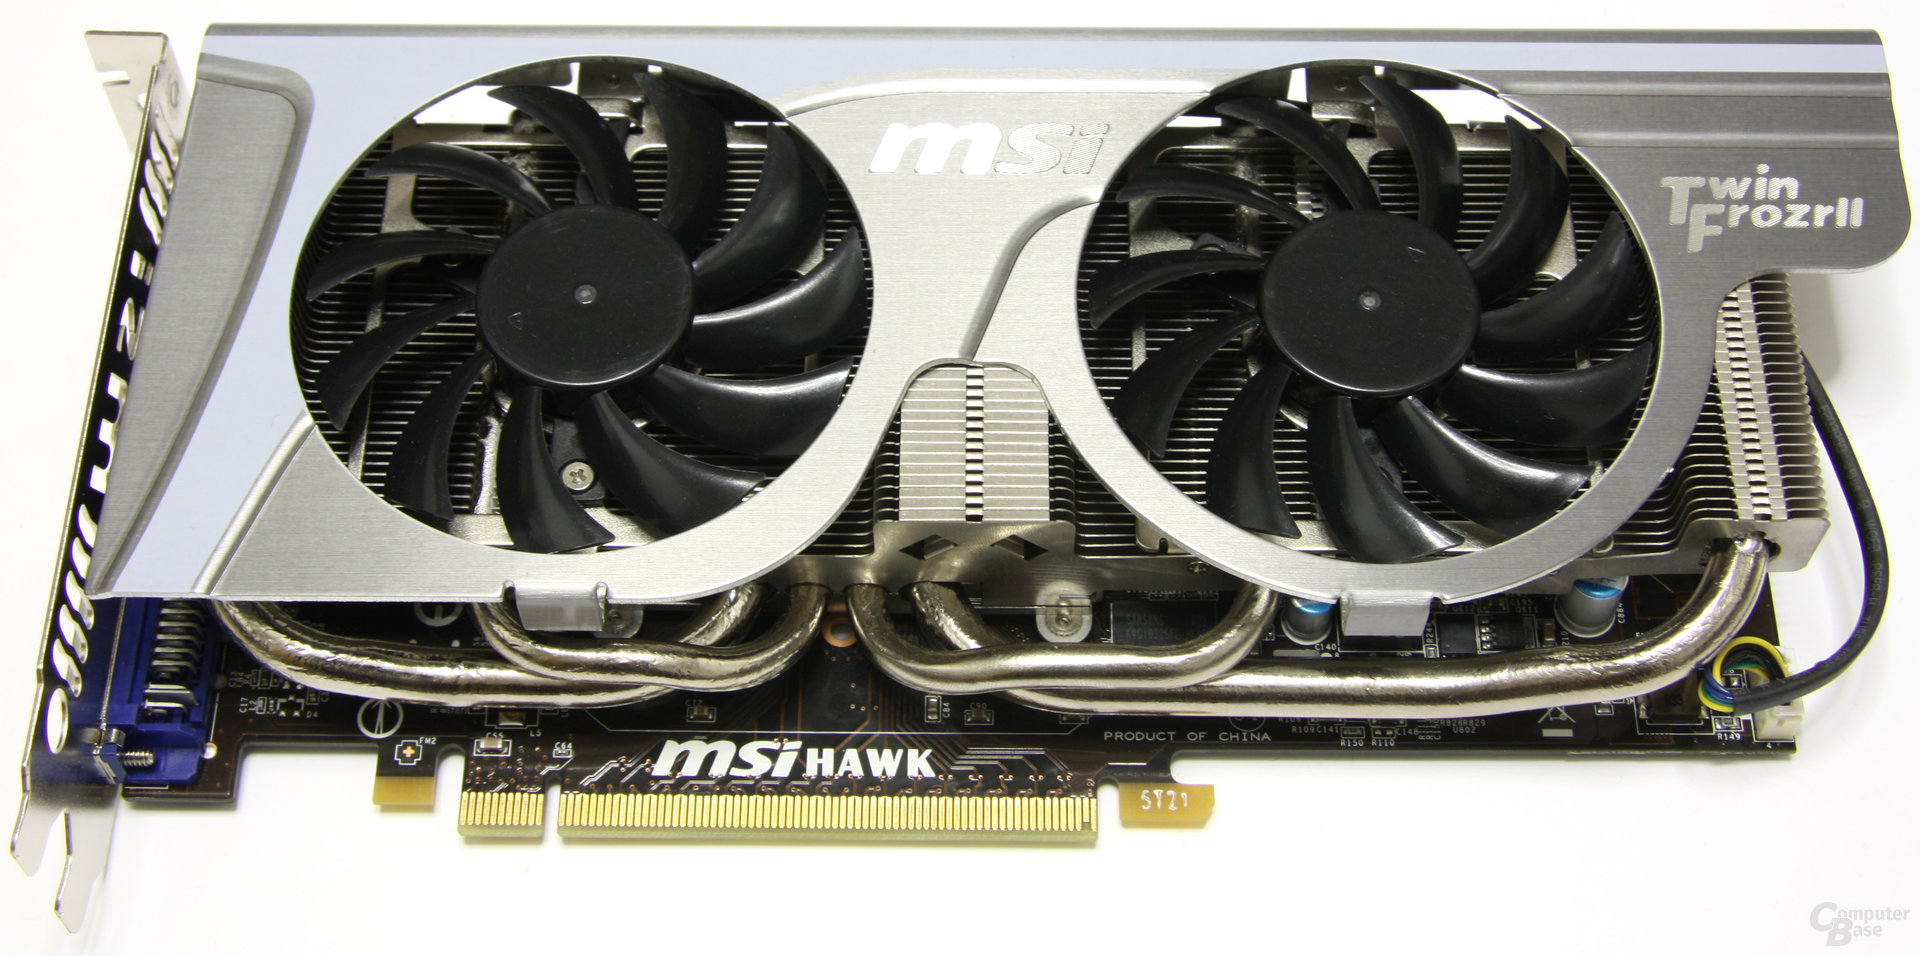 MSI GeForce GTX 460 Hawk